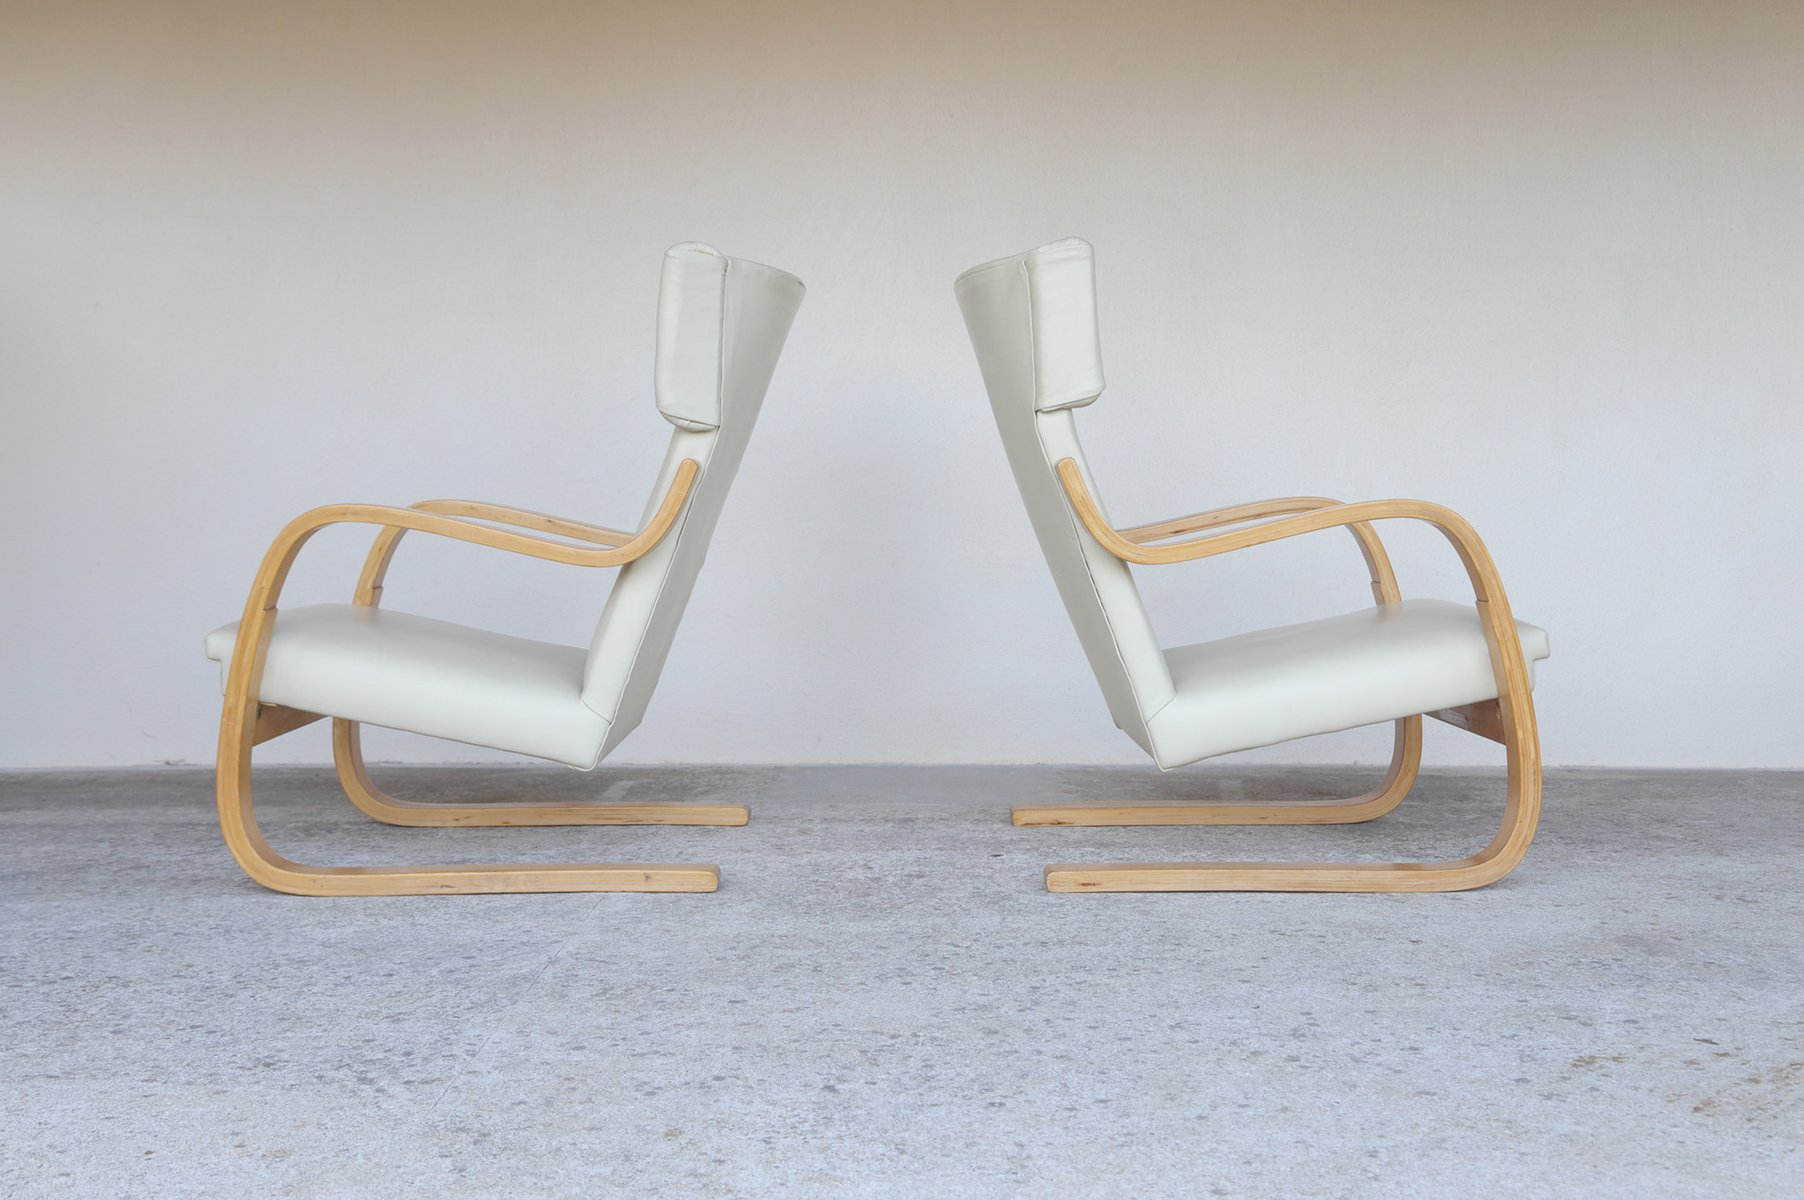 alvar aalto furniture. contemporary alvar model 401 chairs by alvar aalto 1935 set of 2 on aalto furniture